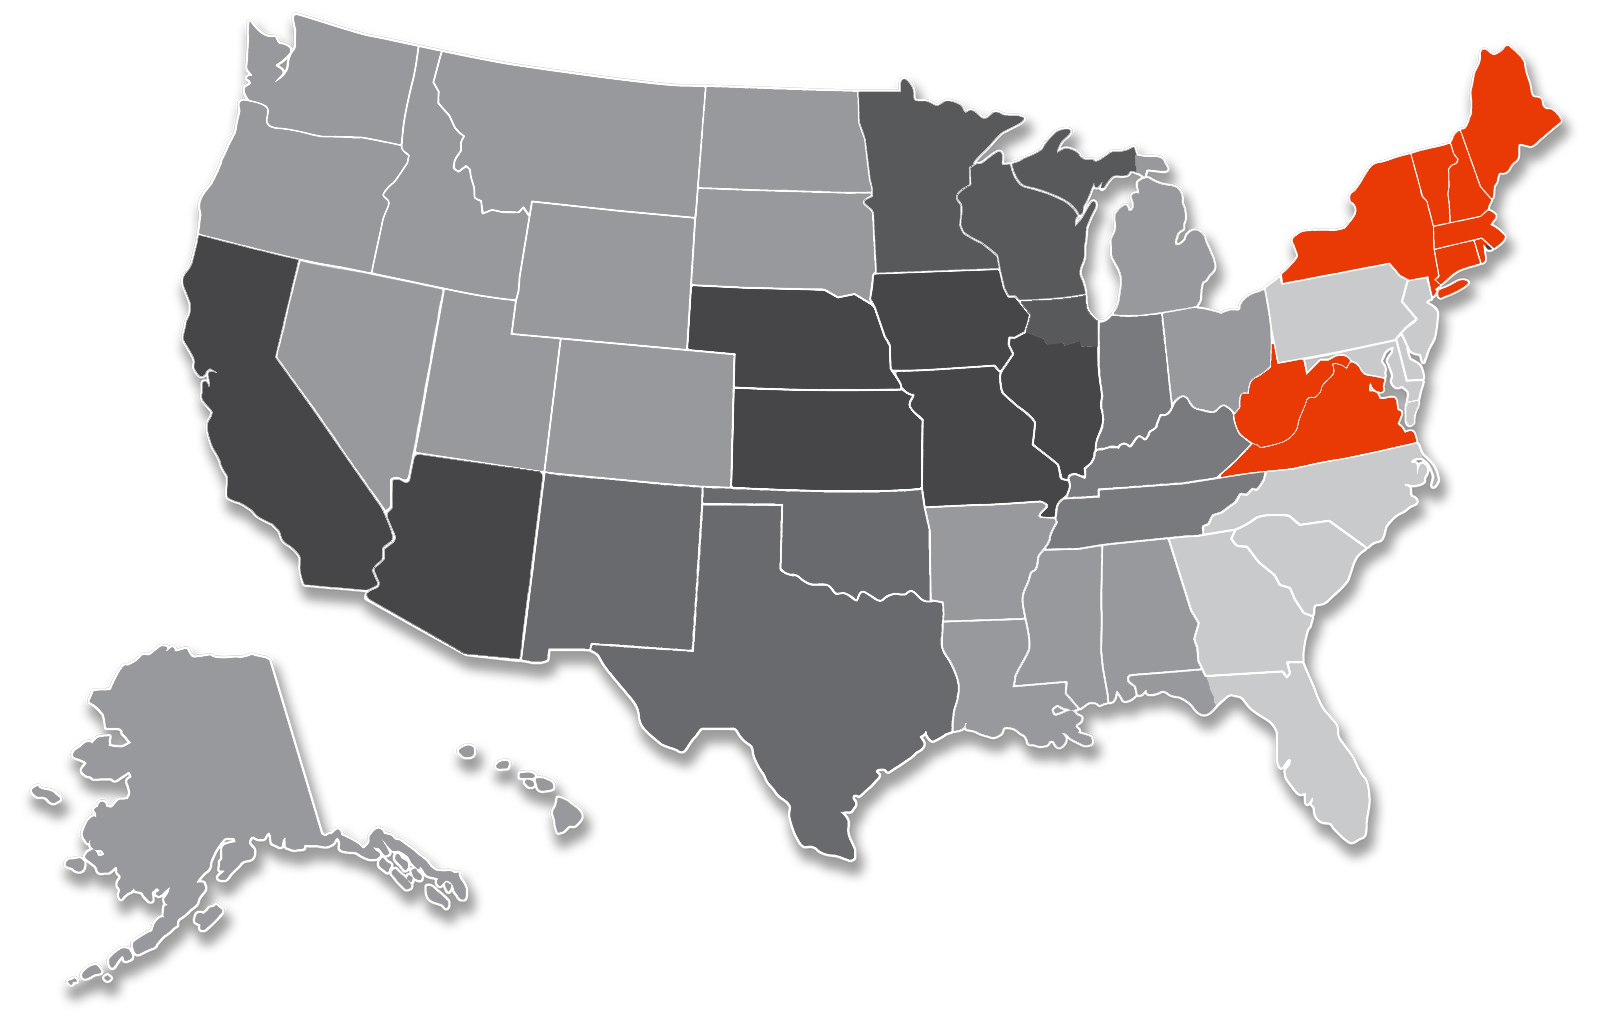 T1 - East/Northeast Territory